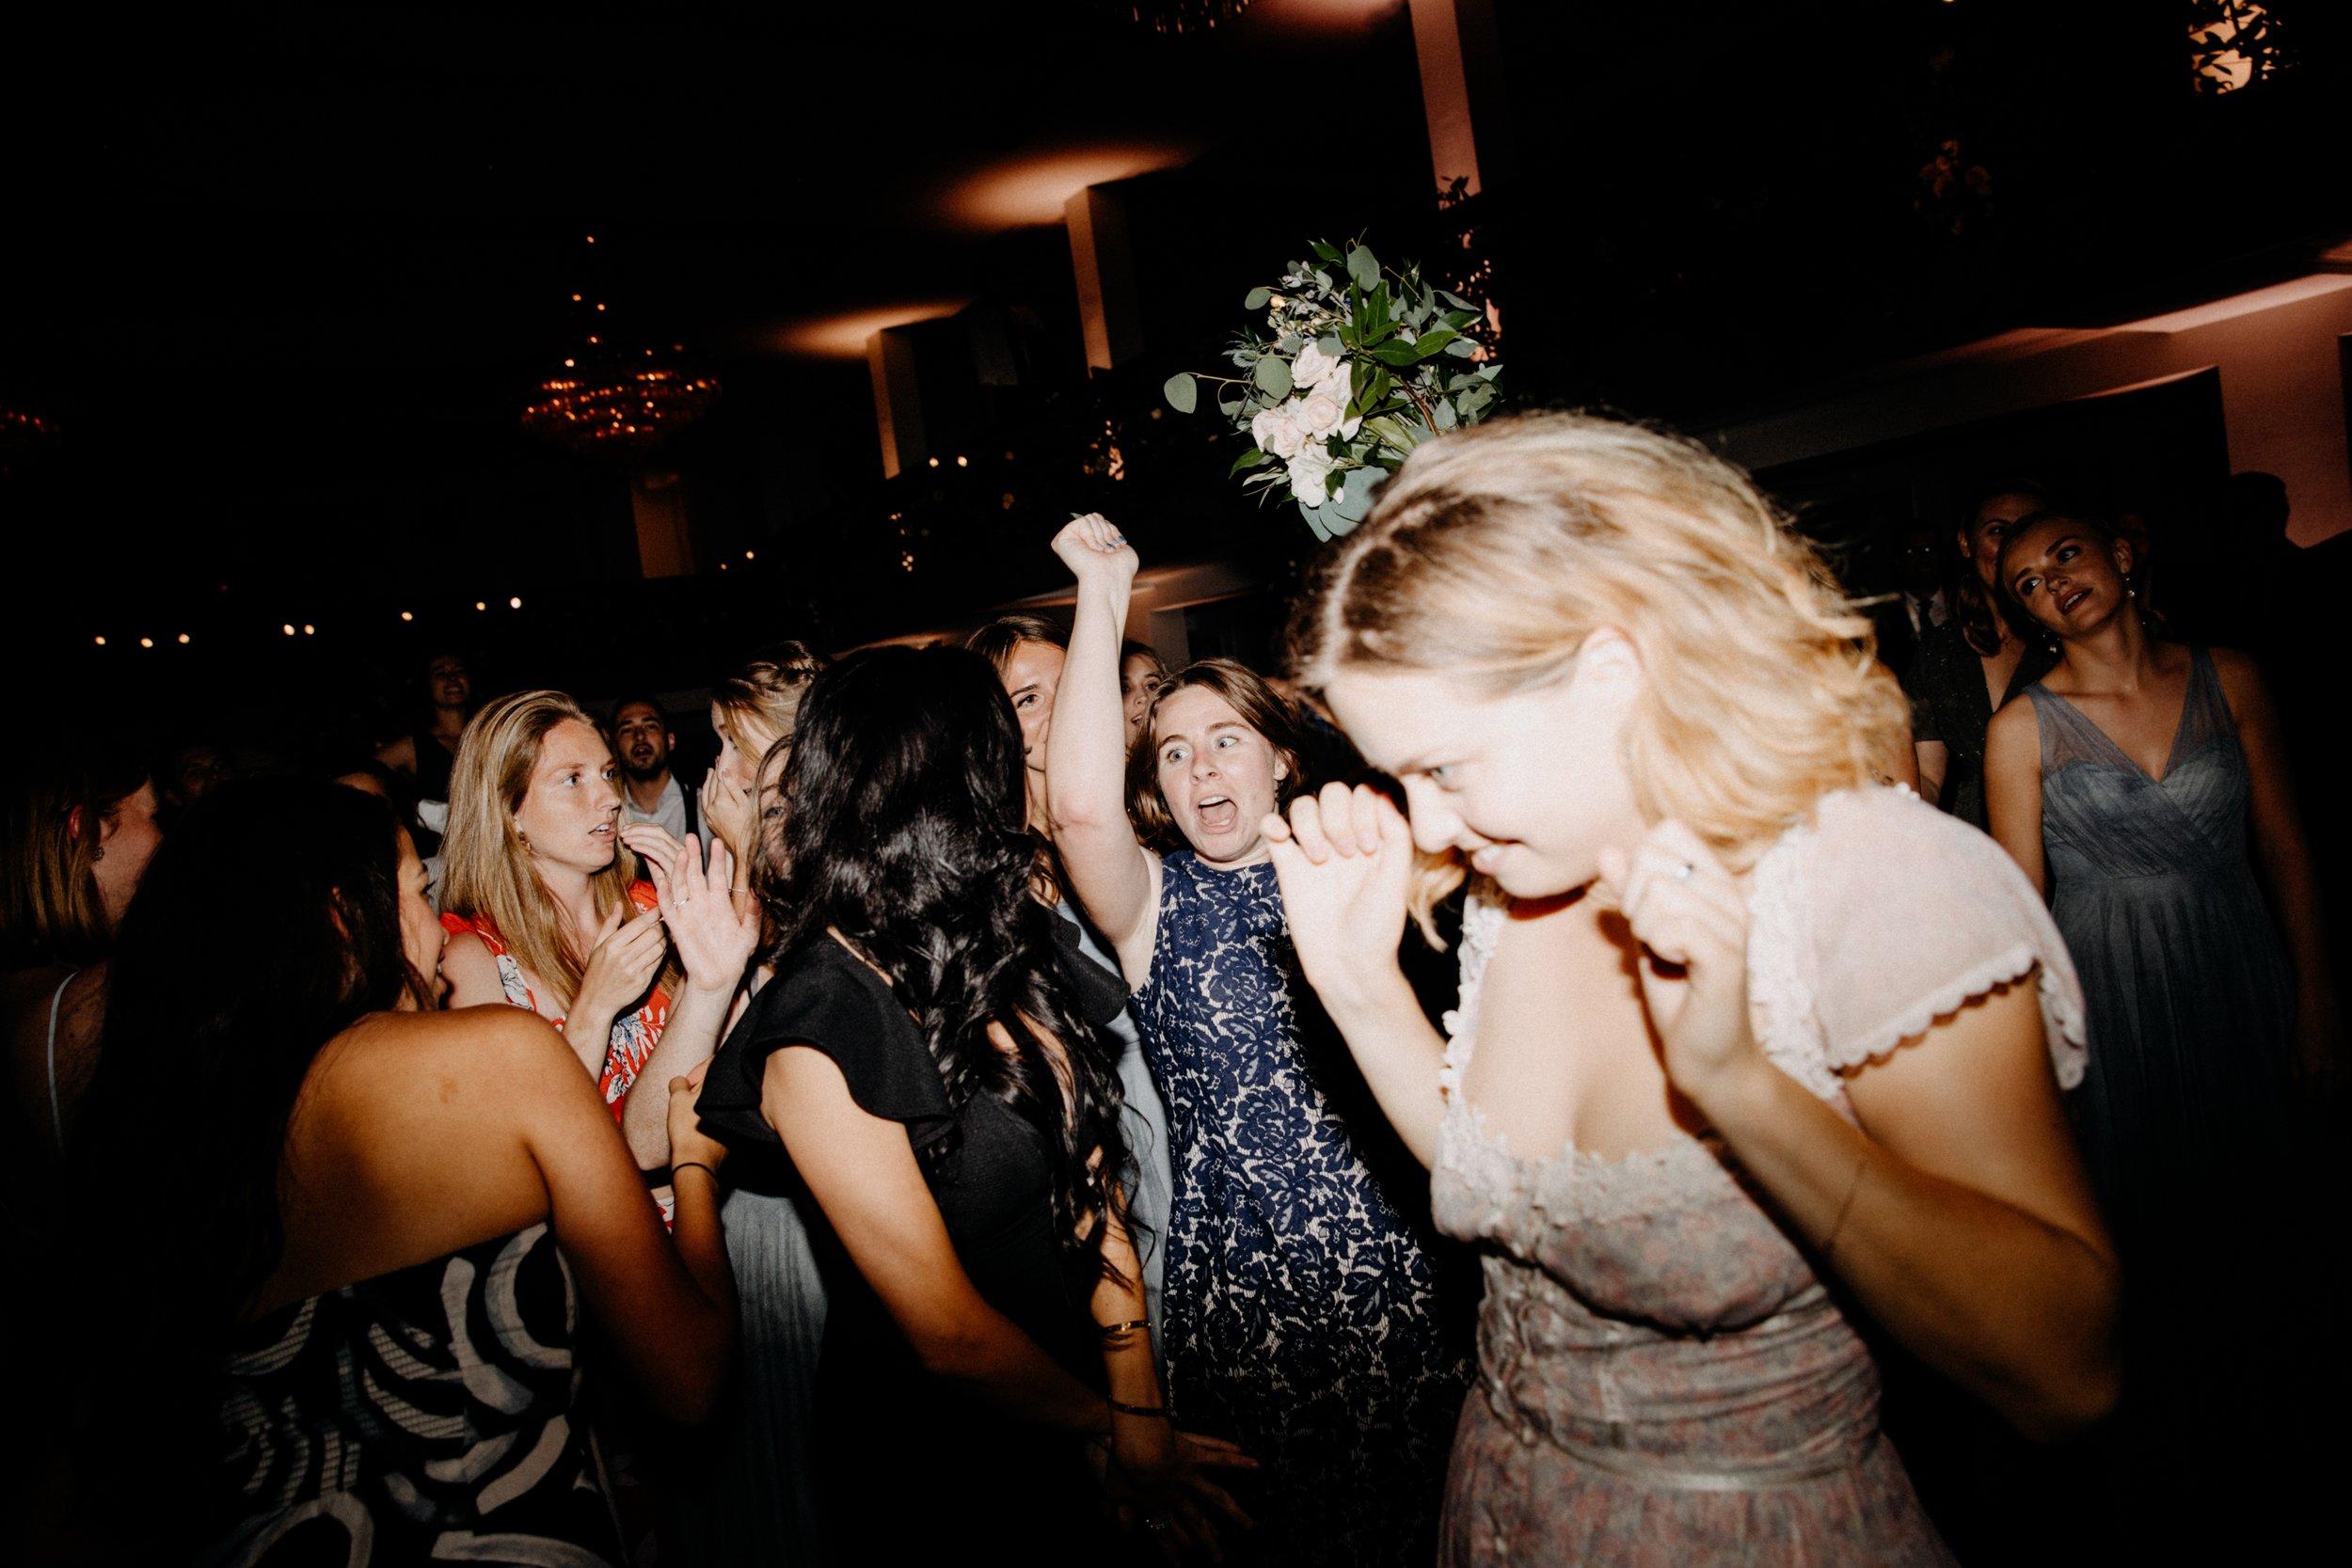 st-anthony-hotel-wedding-photography-10179san-antonio.JPG